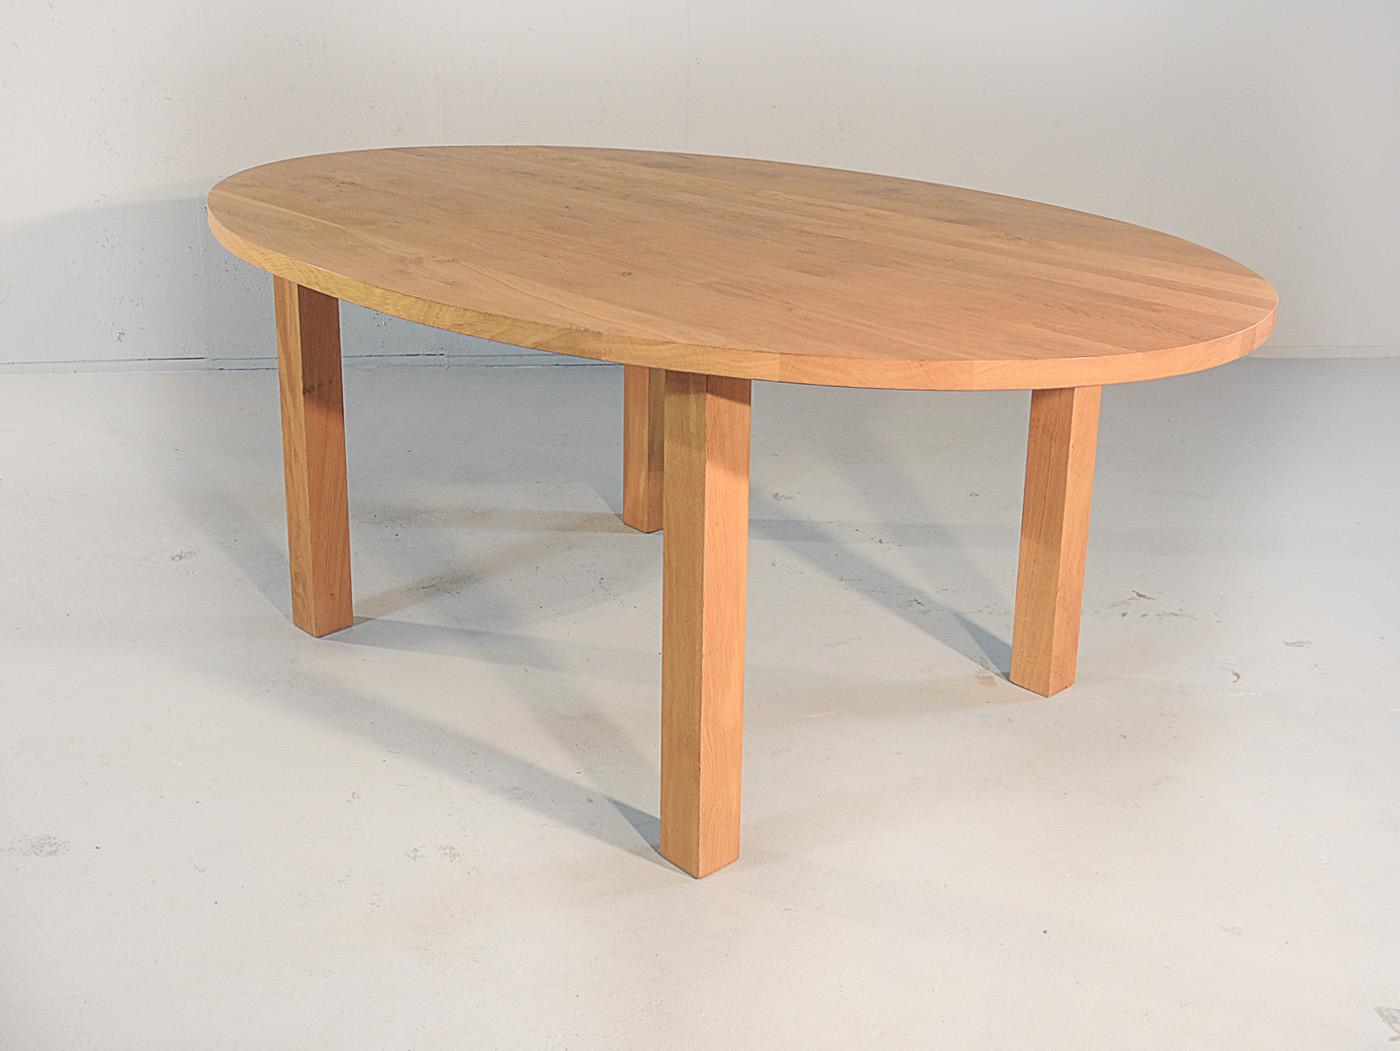 Caen - Ovale houten eettafel